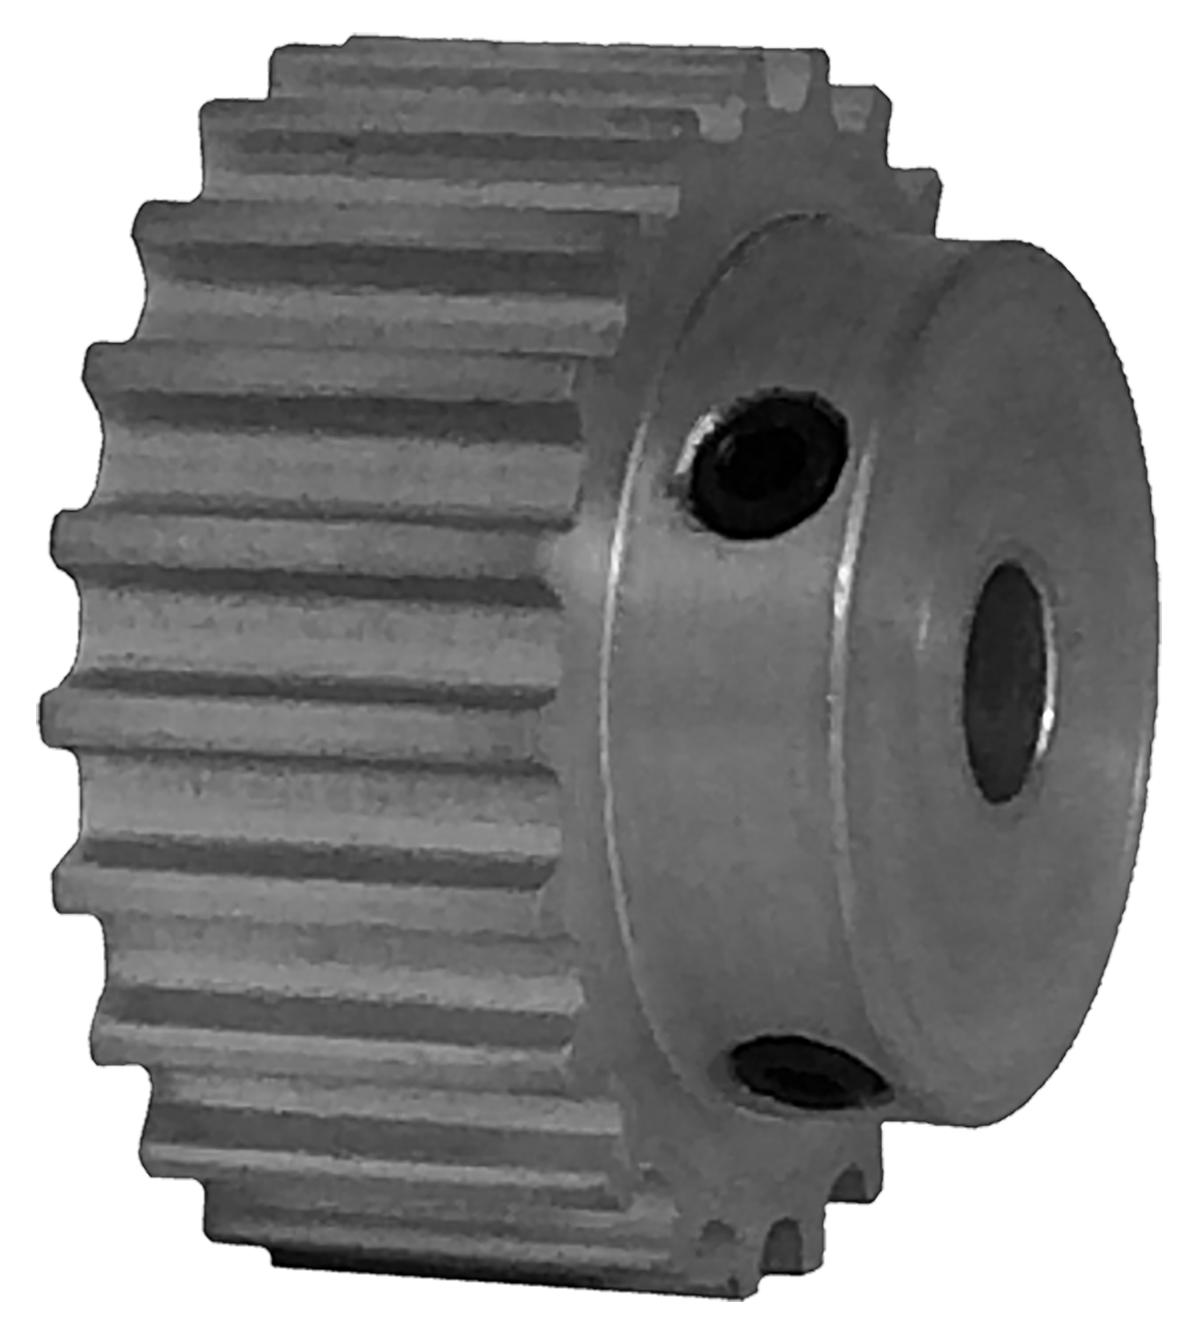 22-5M09-6A3 - Aluminum Powerhouse®HTD® Pulleys